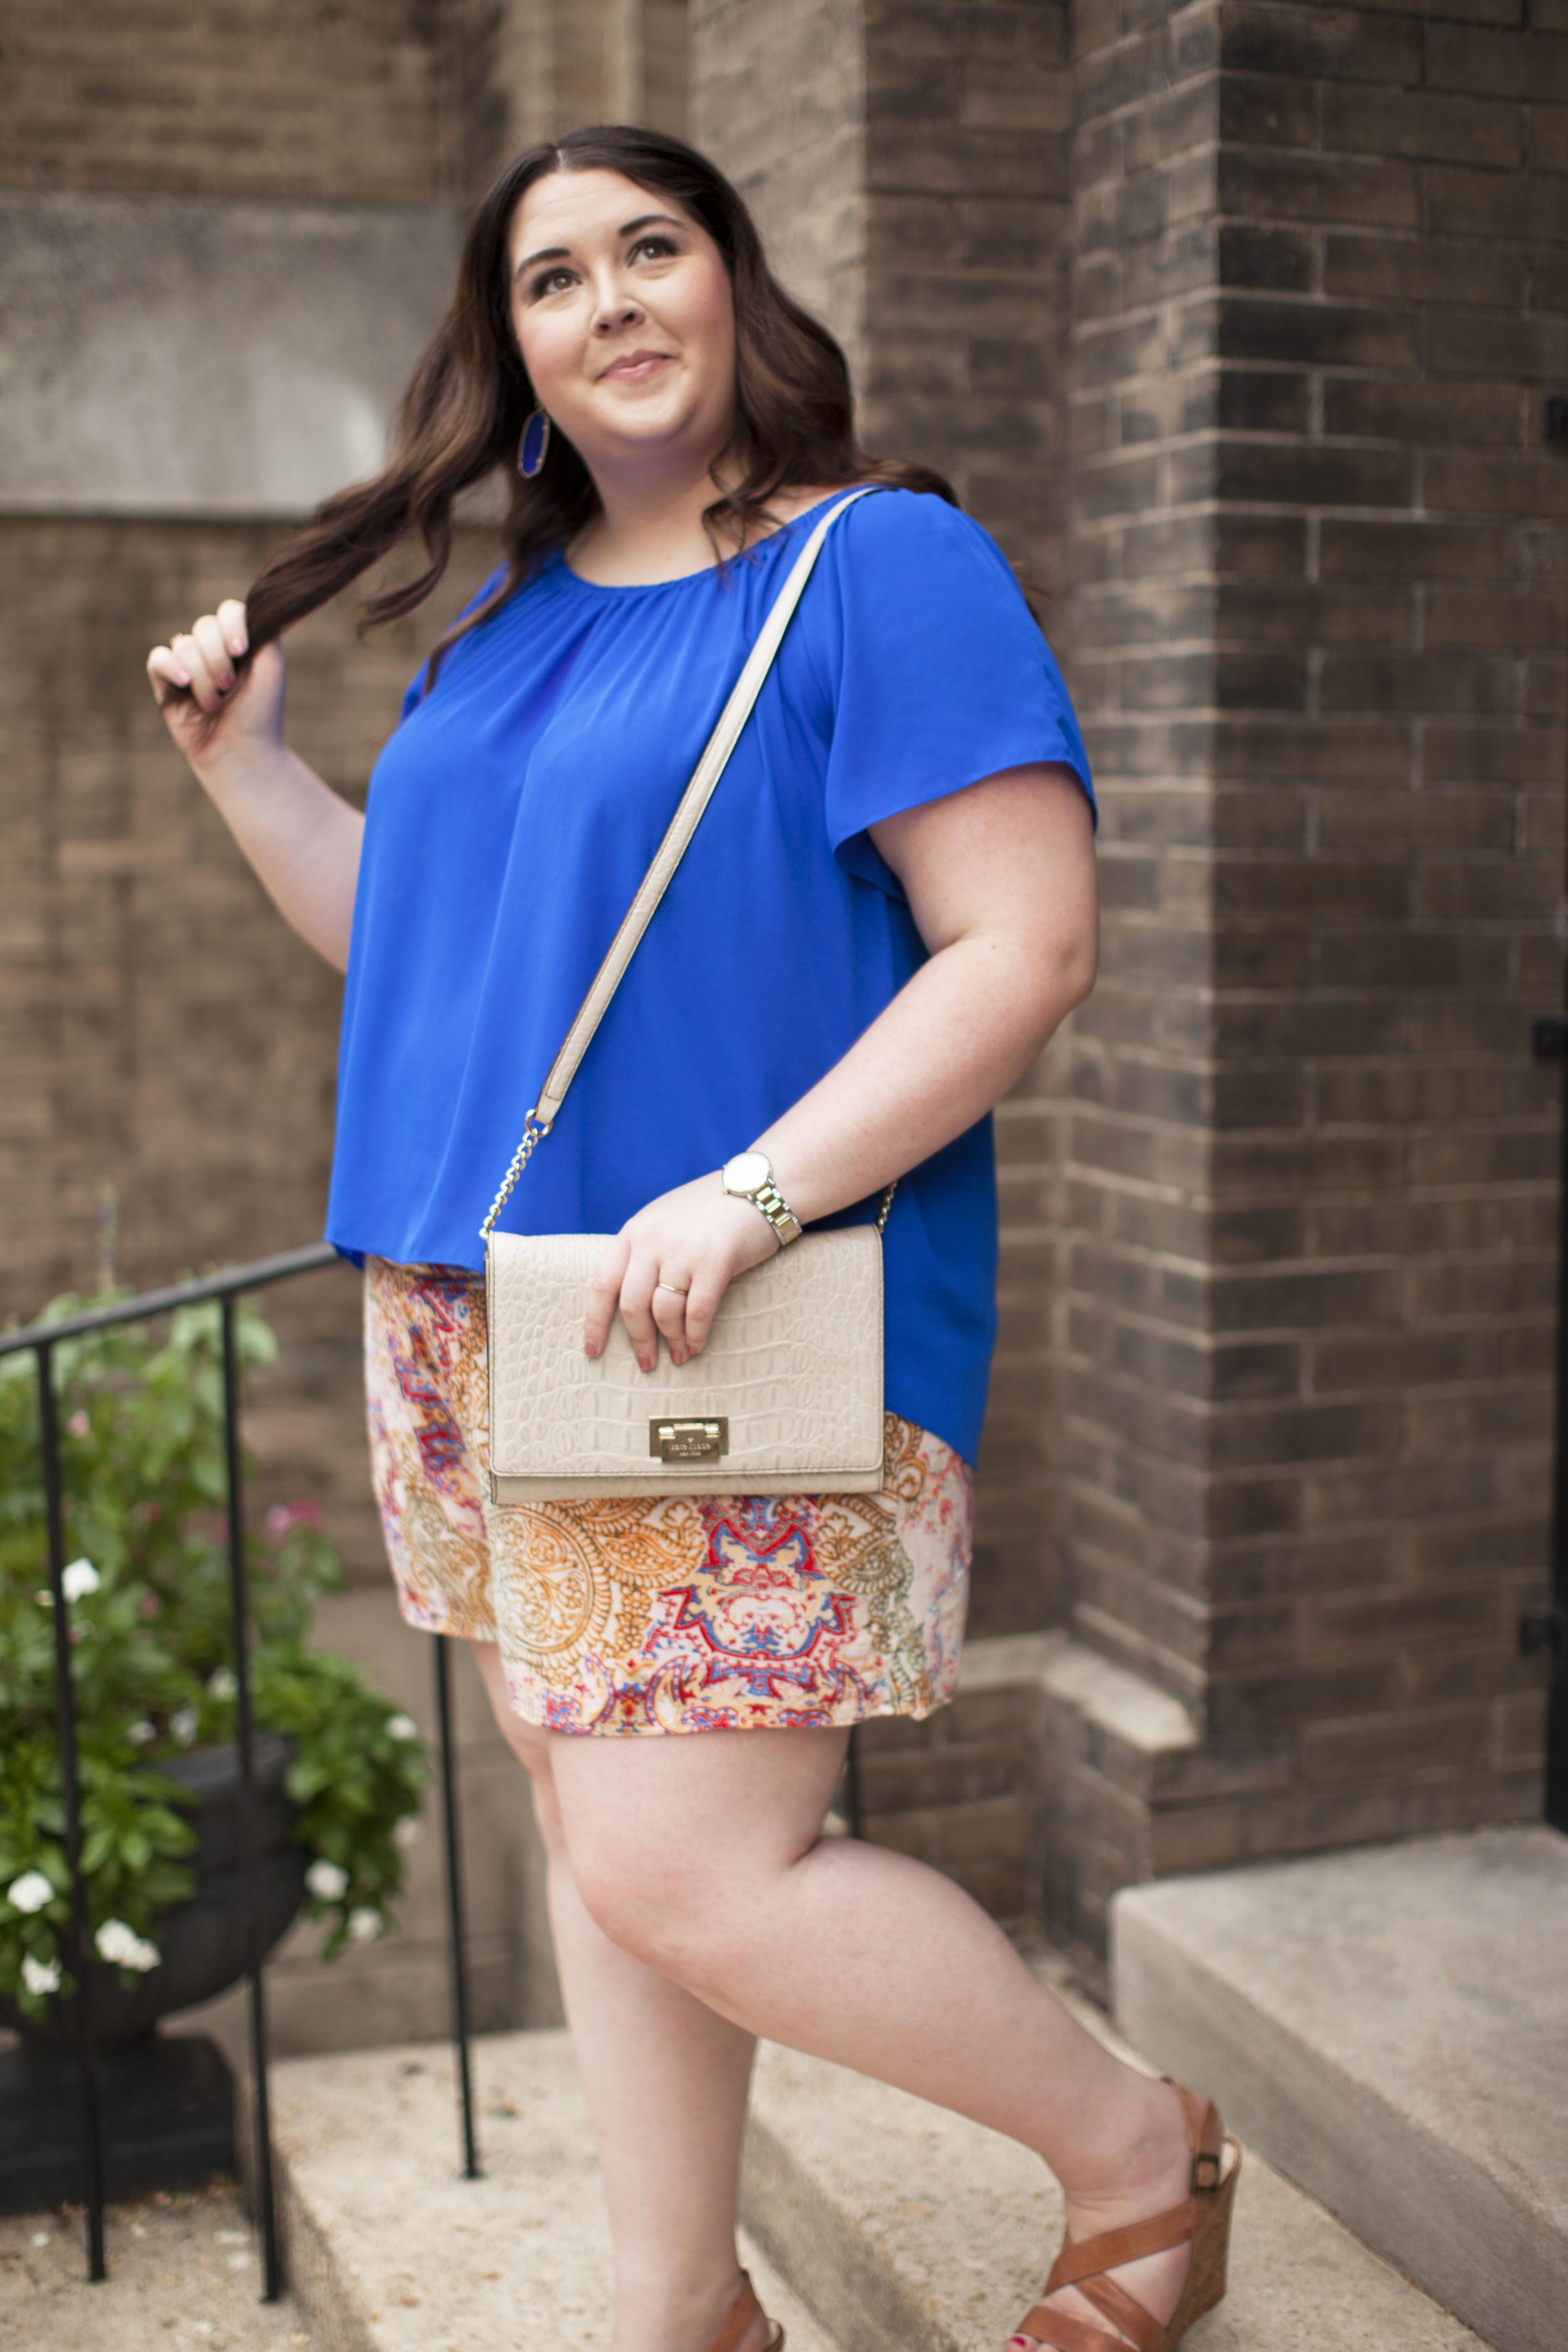 plus size street style royal blue top plus size linen shorts 010.jpg